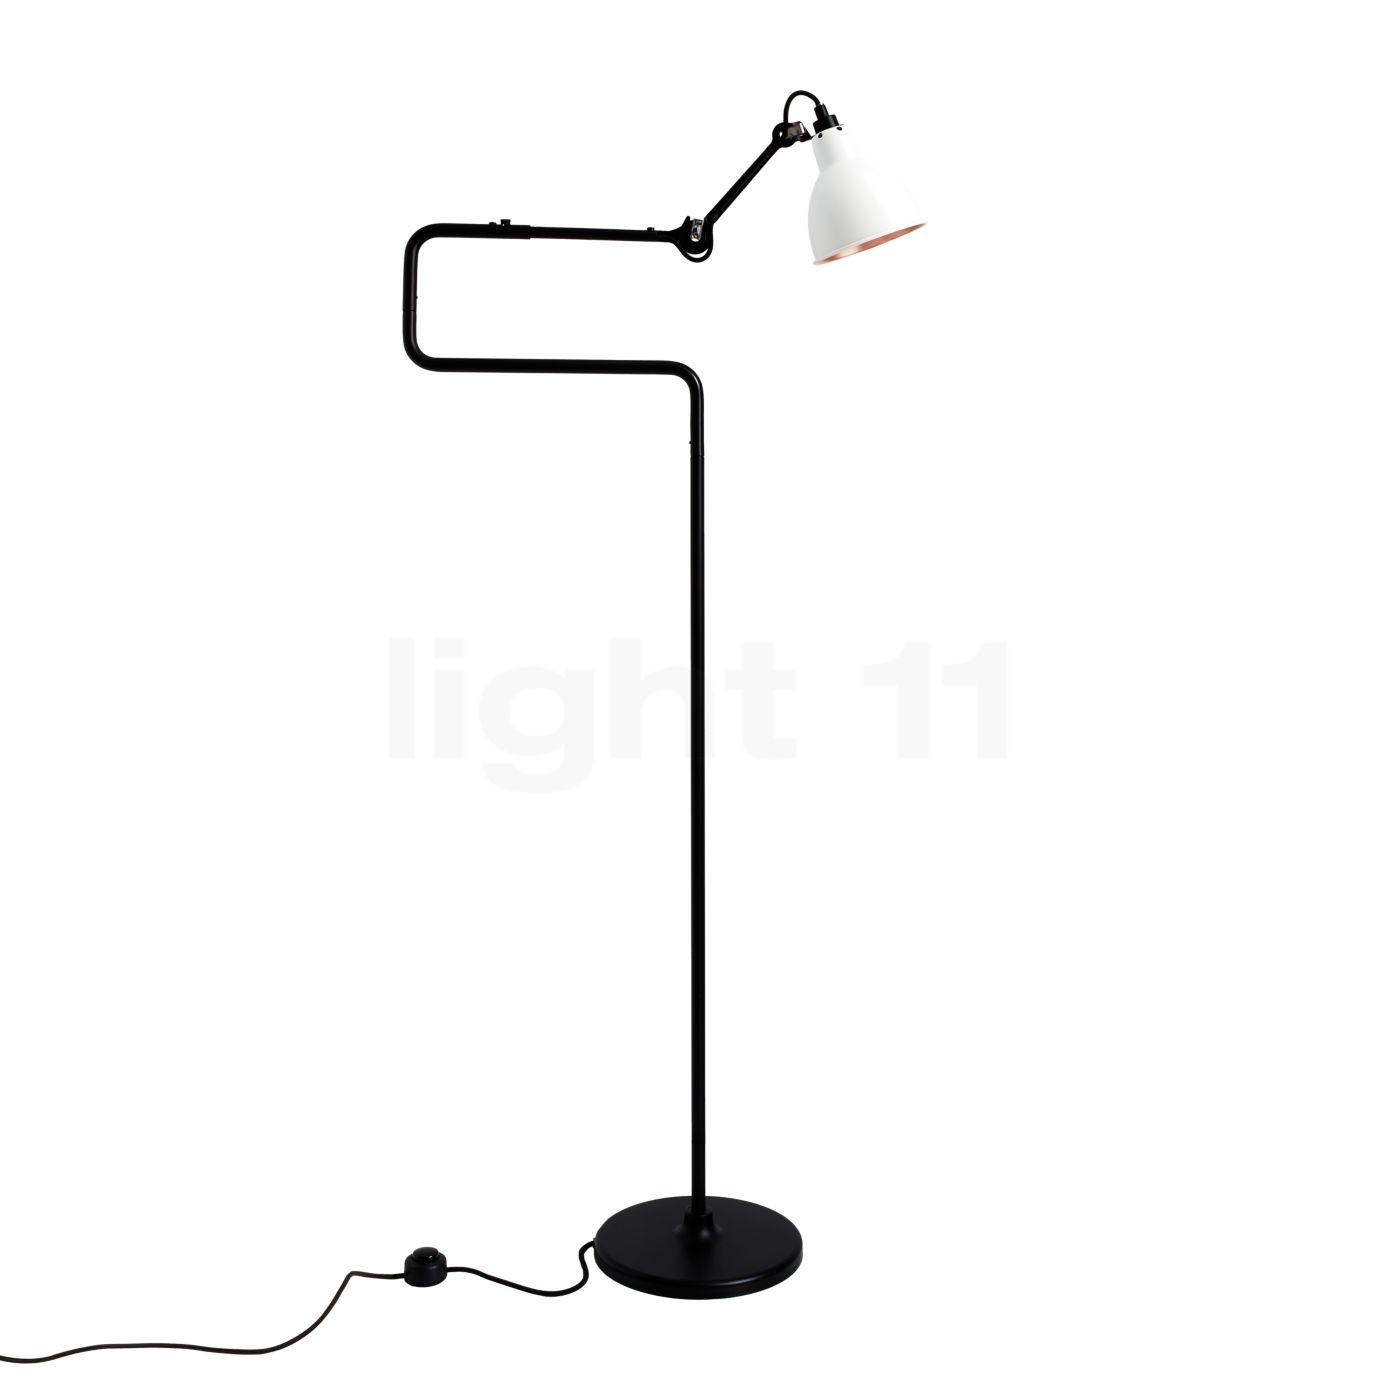 Buy Dcw Lampe Gras No 411 Floor Lamp At Light11 Eu